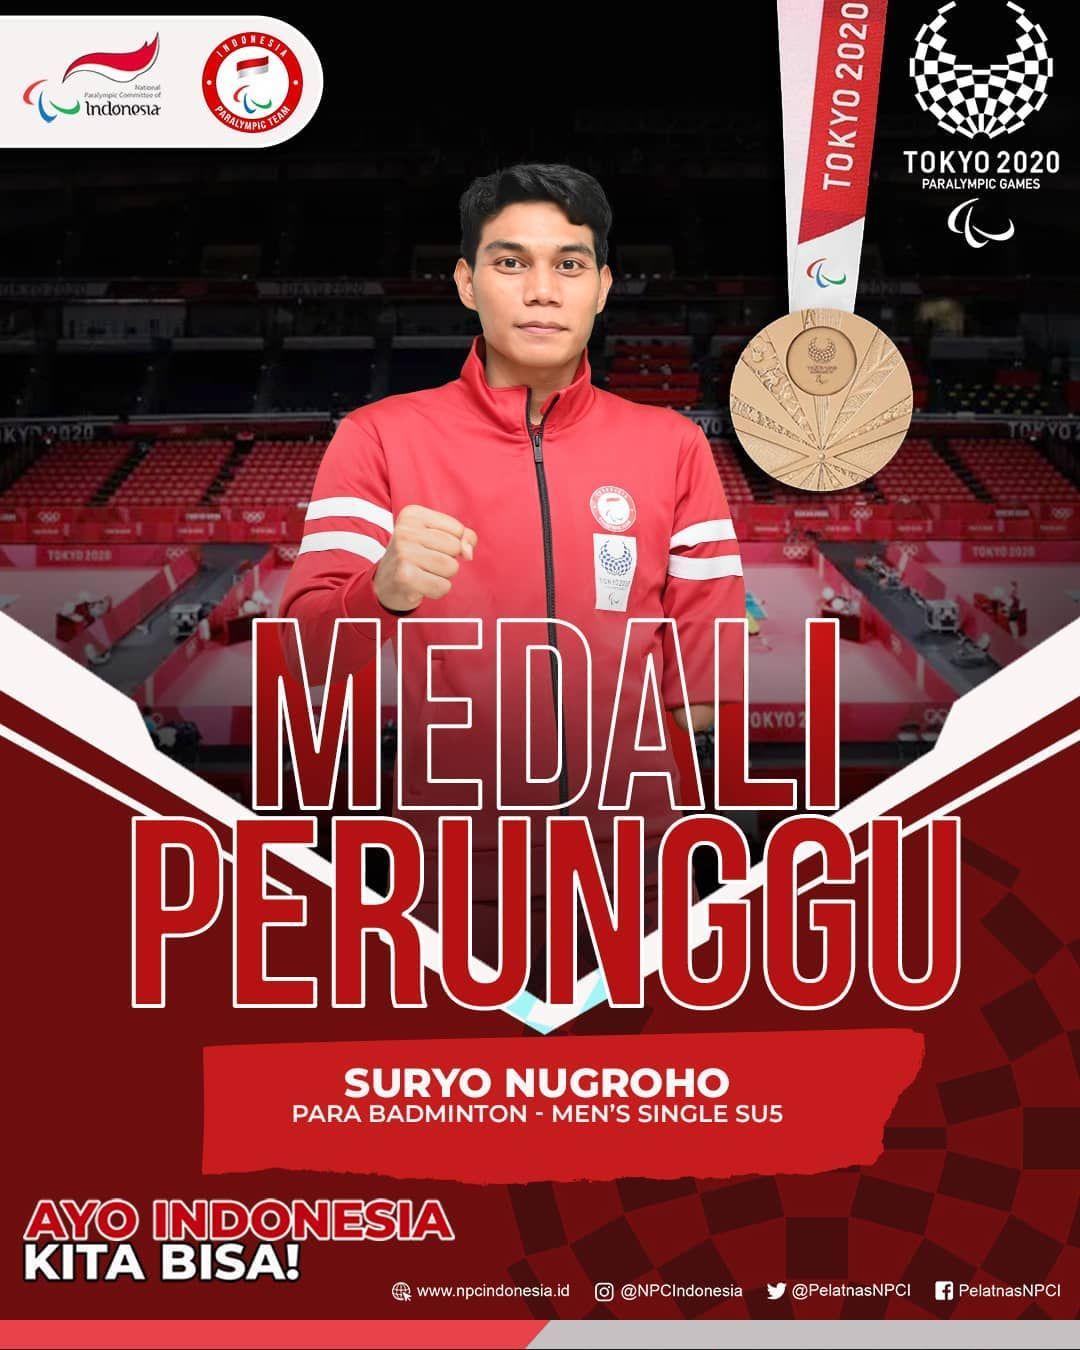 Atlet Suryo Nugroho